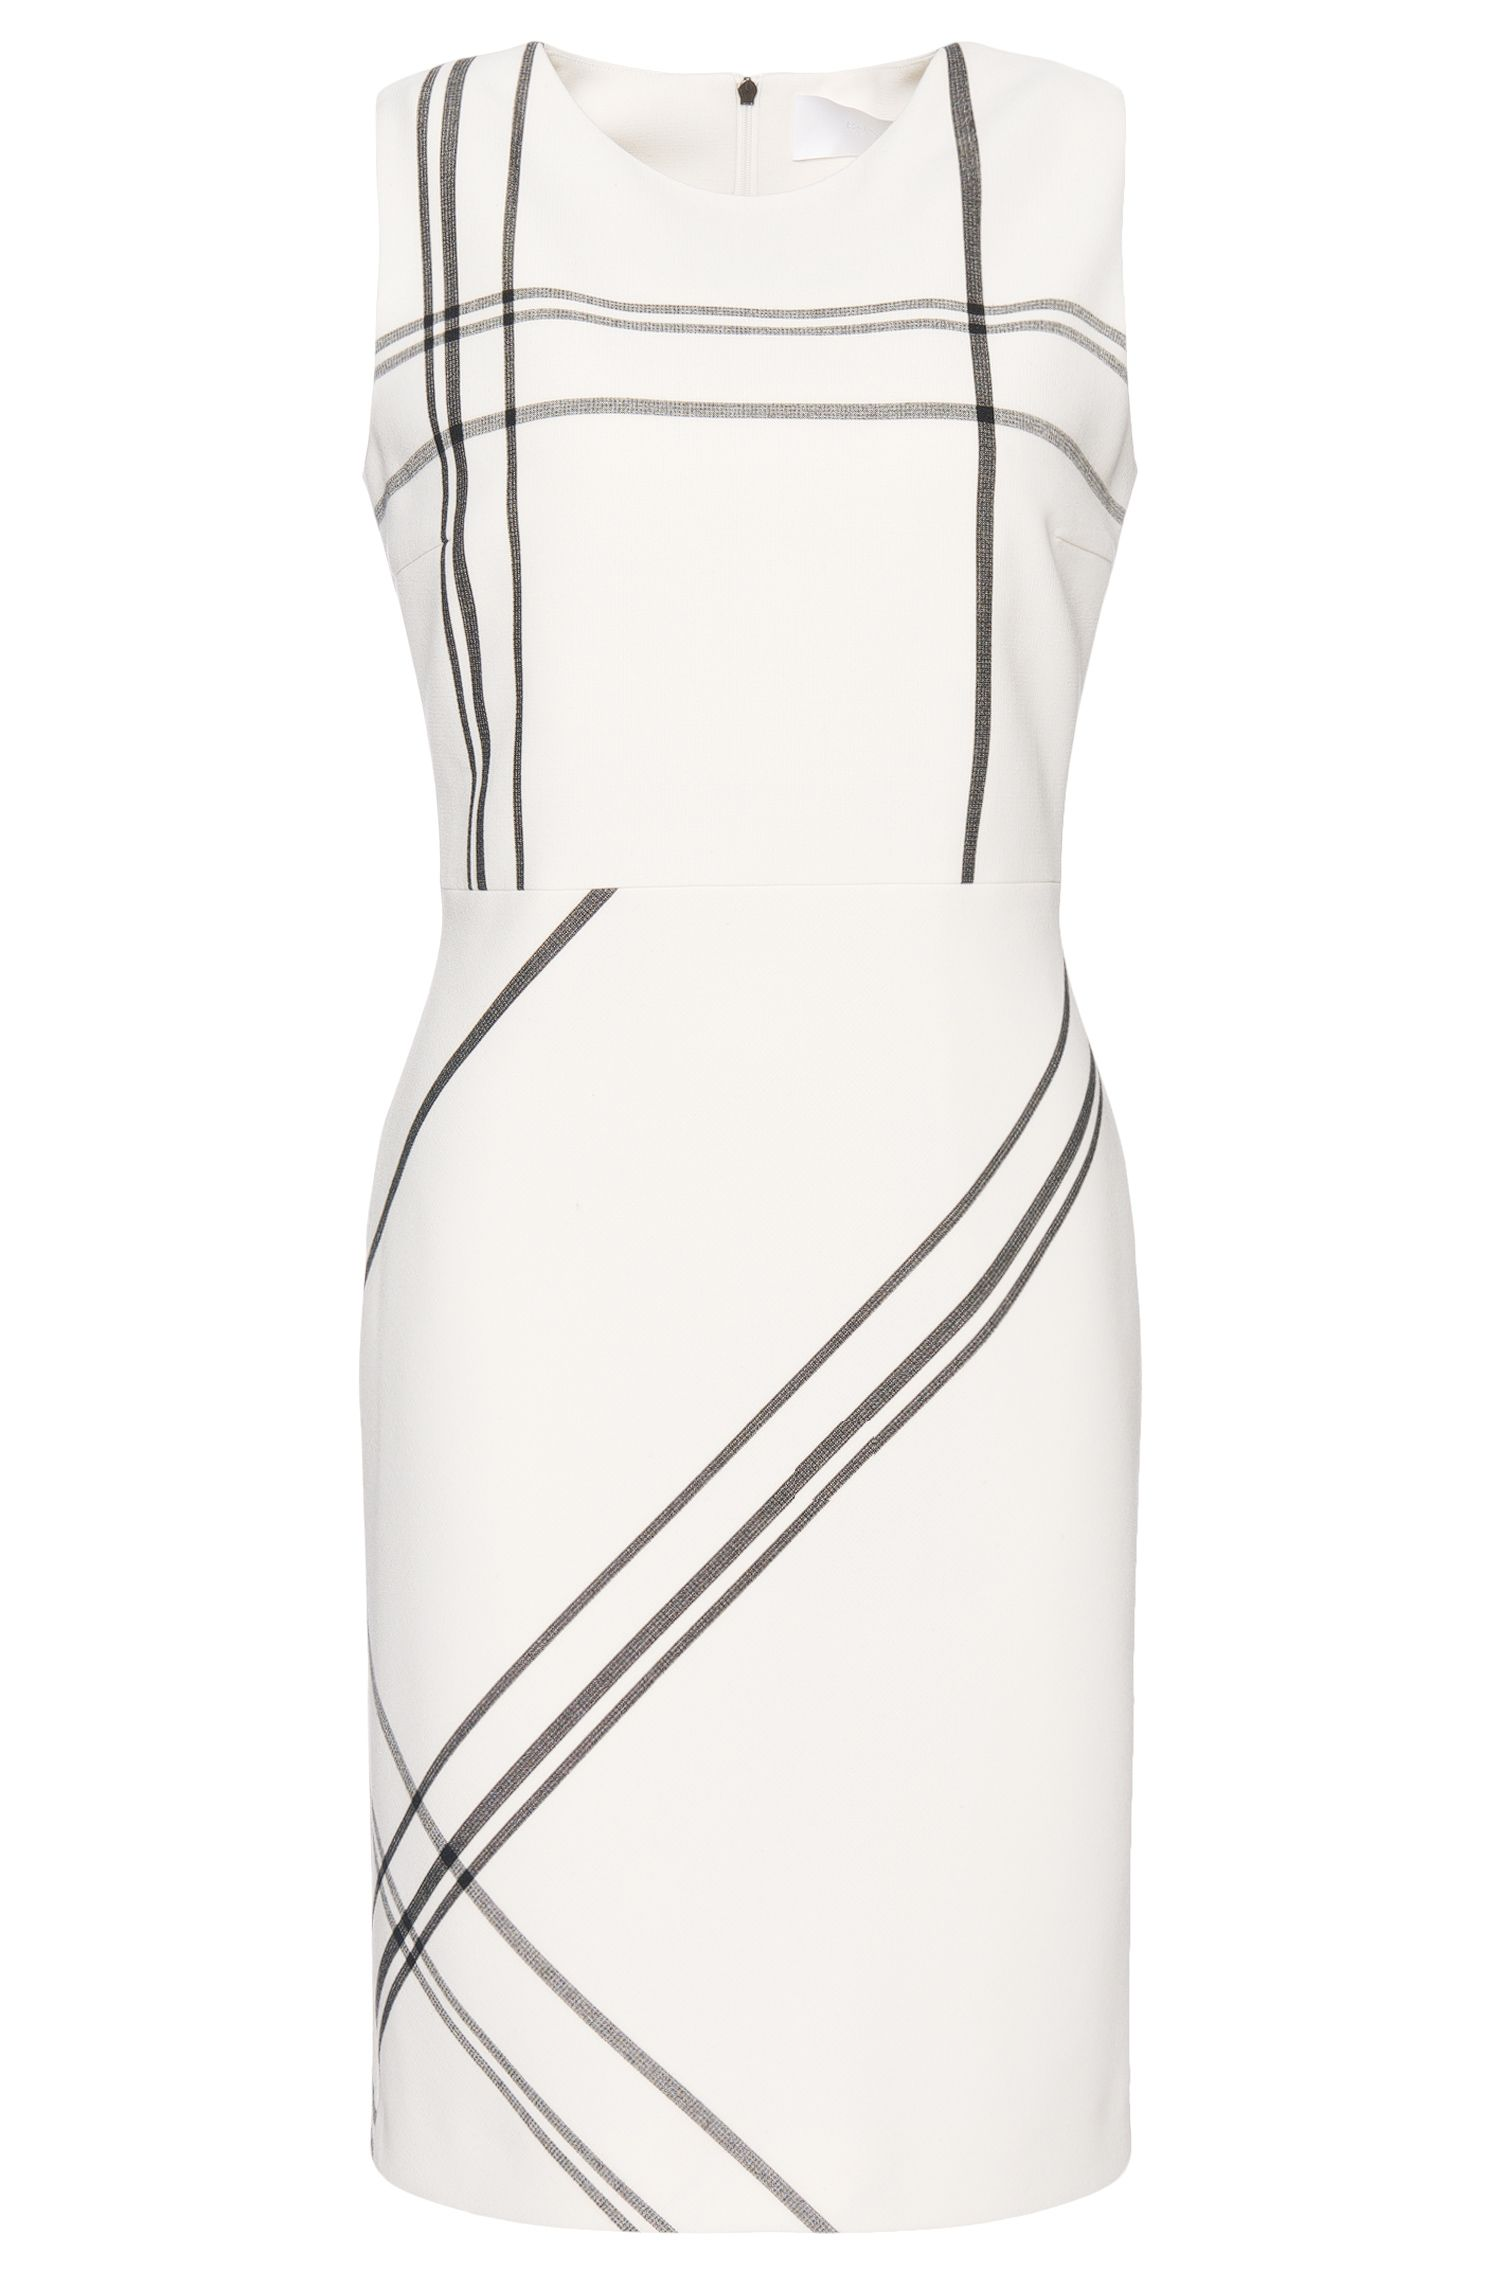 Etui-jurk in een grafisch streepdesign: 'Hiamma'